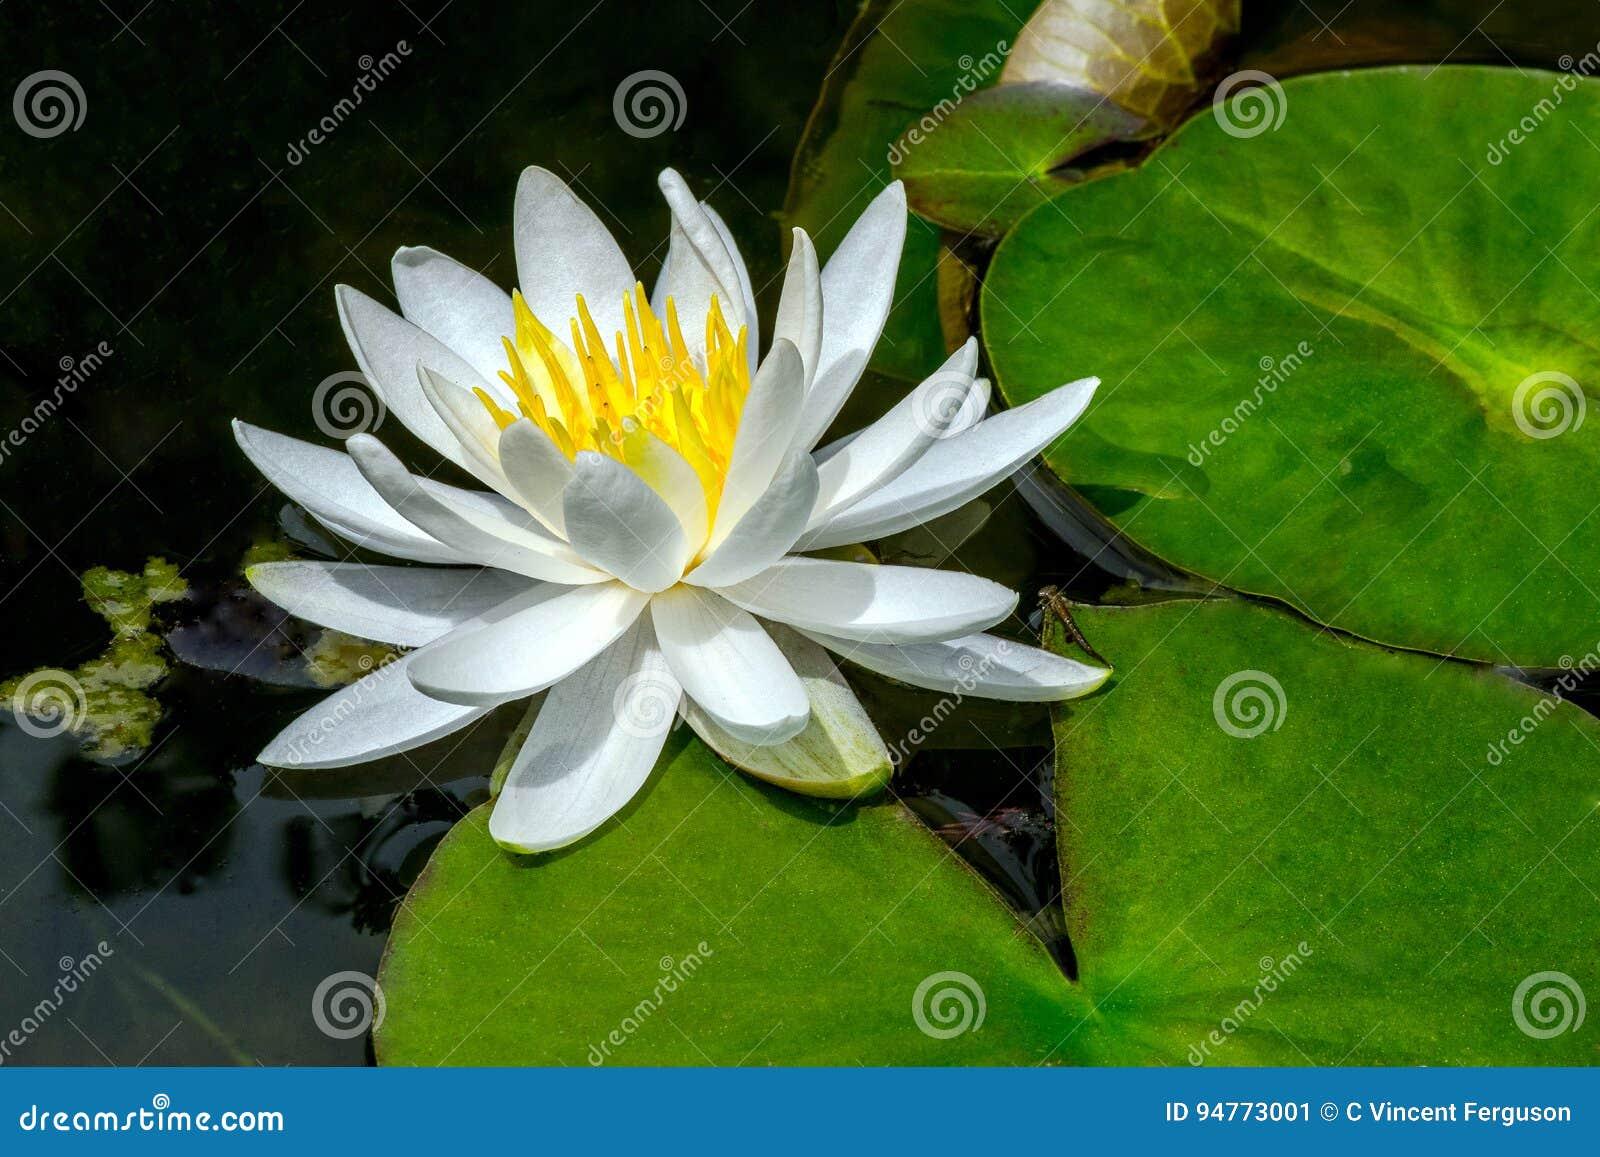 White Lotus Green Lily Pads Stock Image Image Of Waterlily Petal